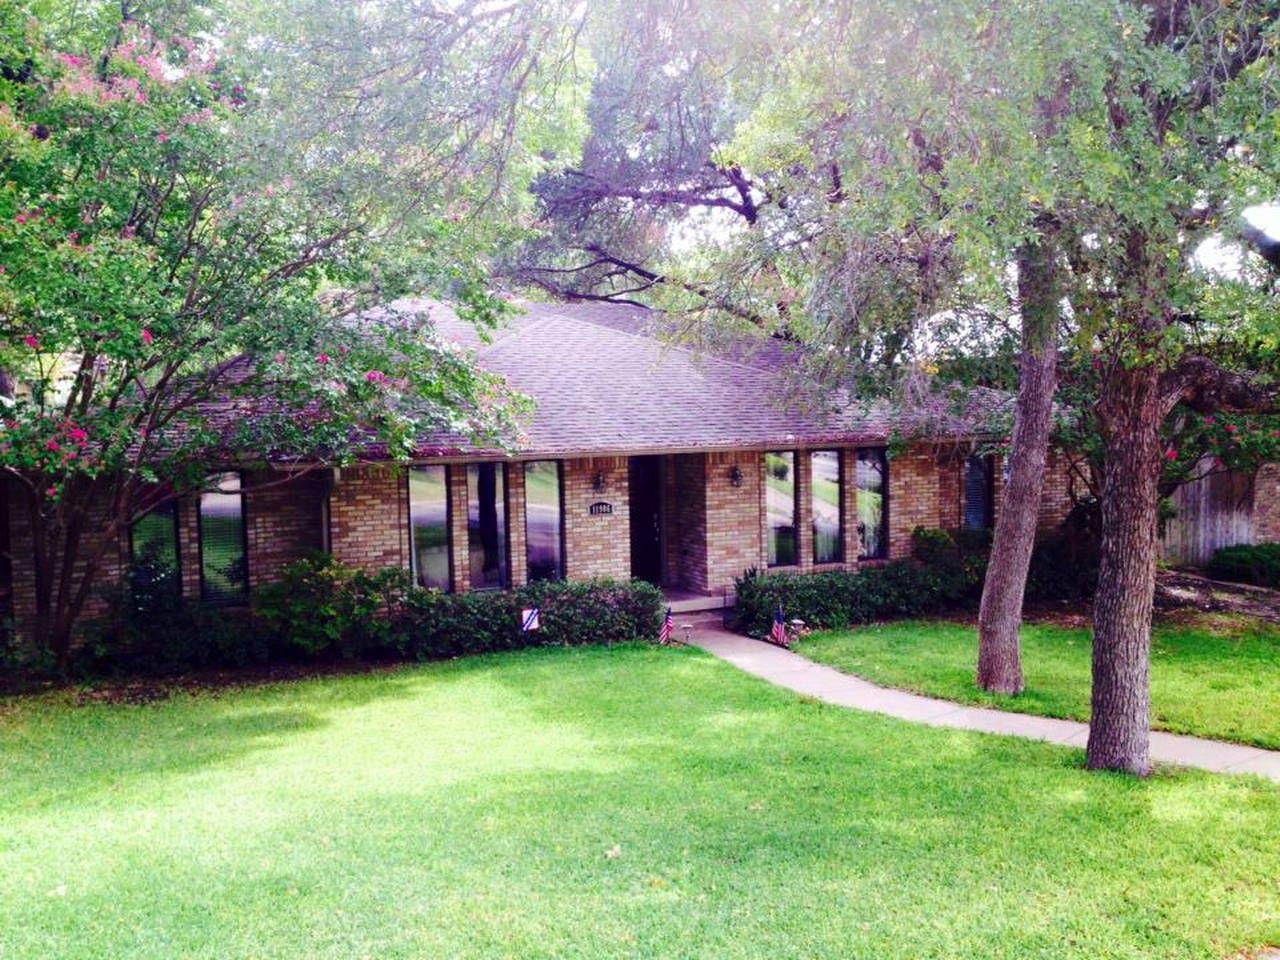 east dallas near white rock lake vacation rental in dallas texas